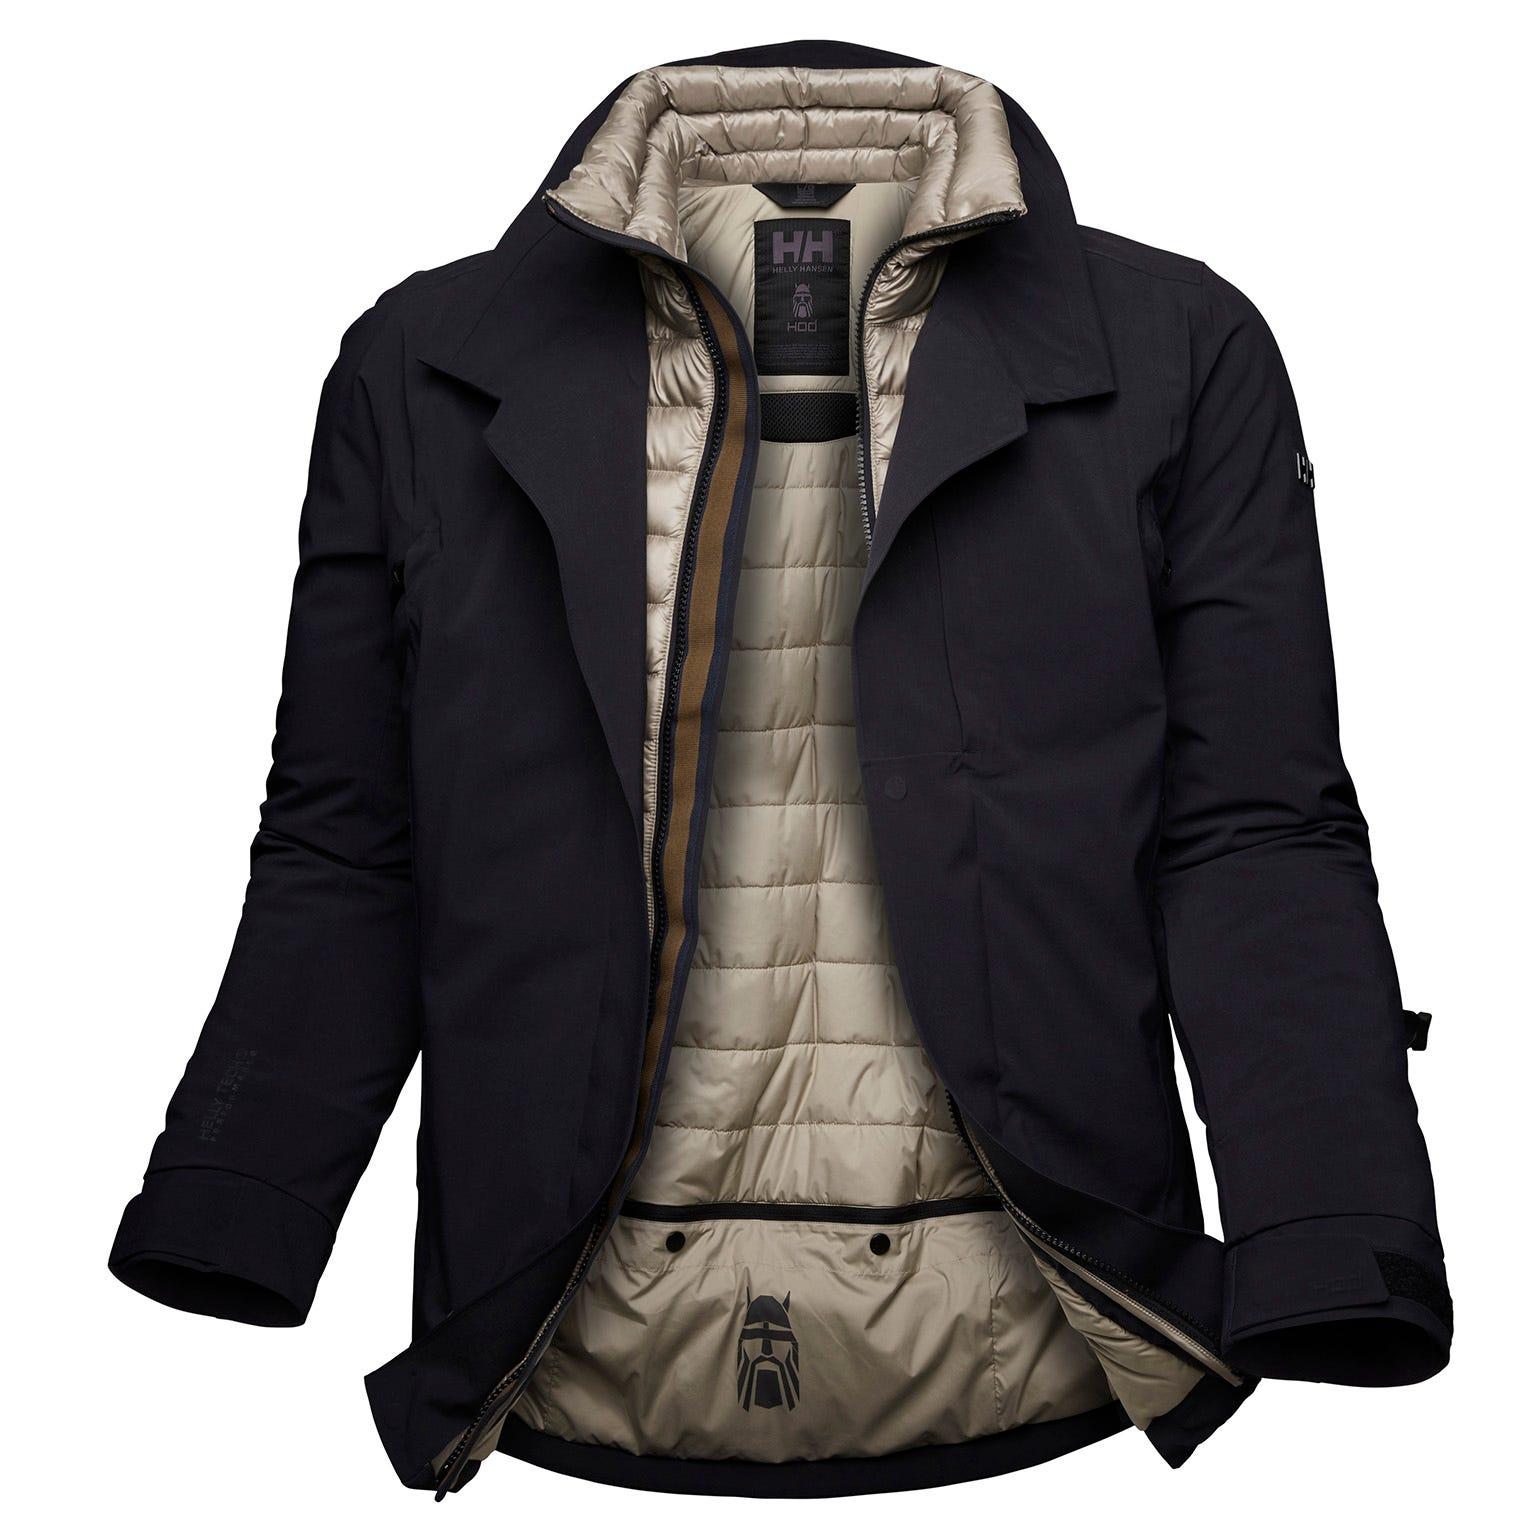 Helly Hansen Icon 3.0 Jacket Mens Black XL